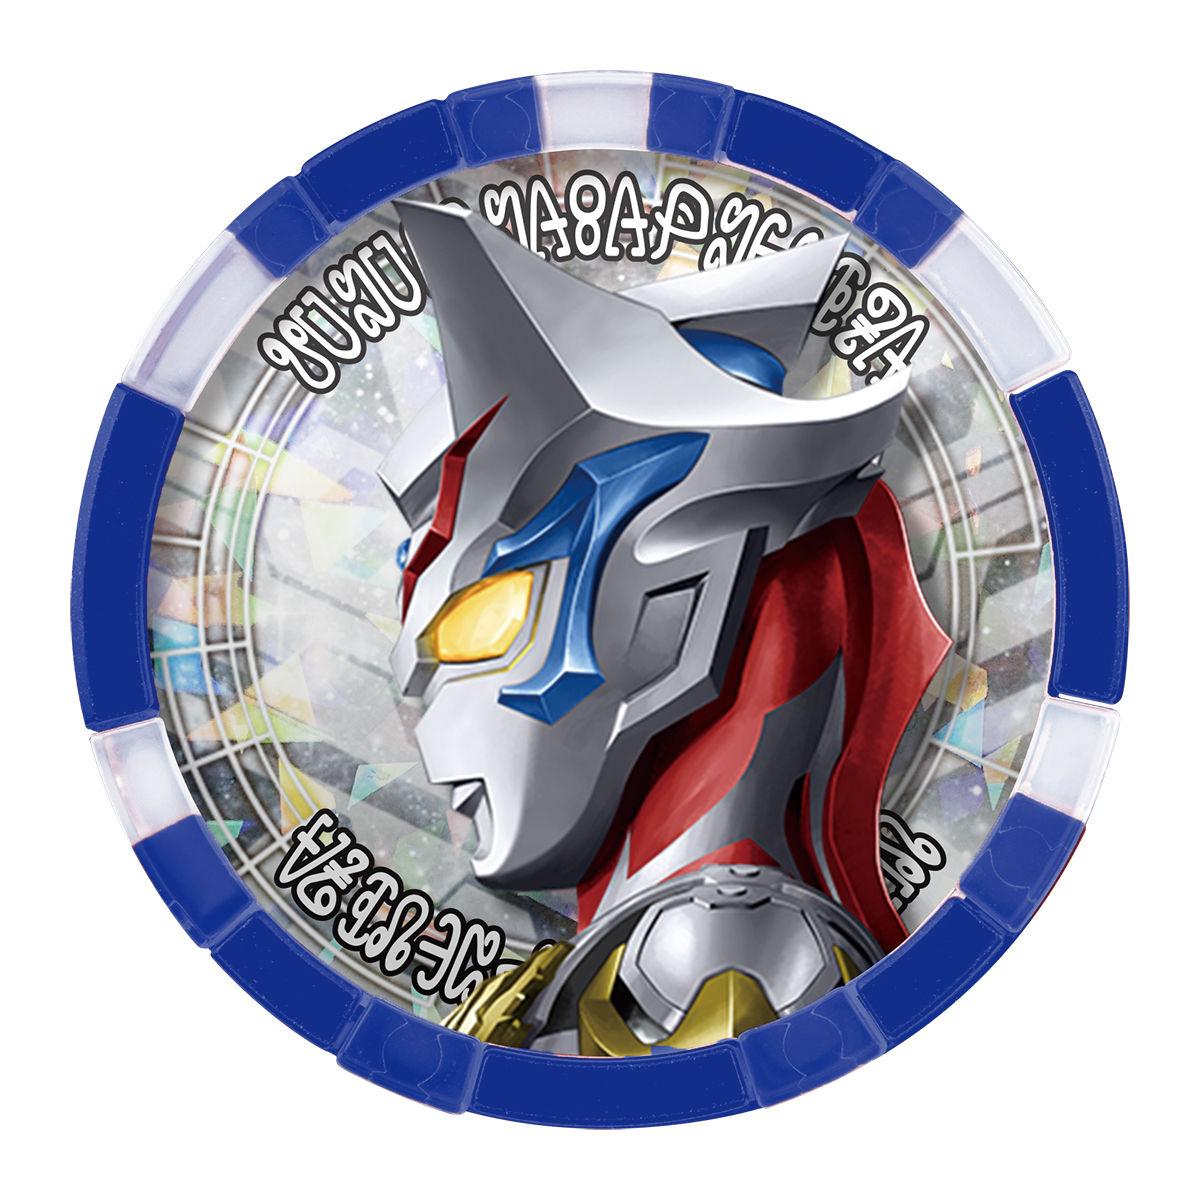 DXウルトラメダル ウルトラレジェンドセットEX03